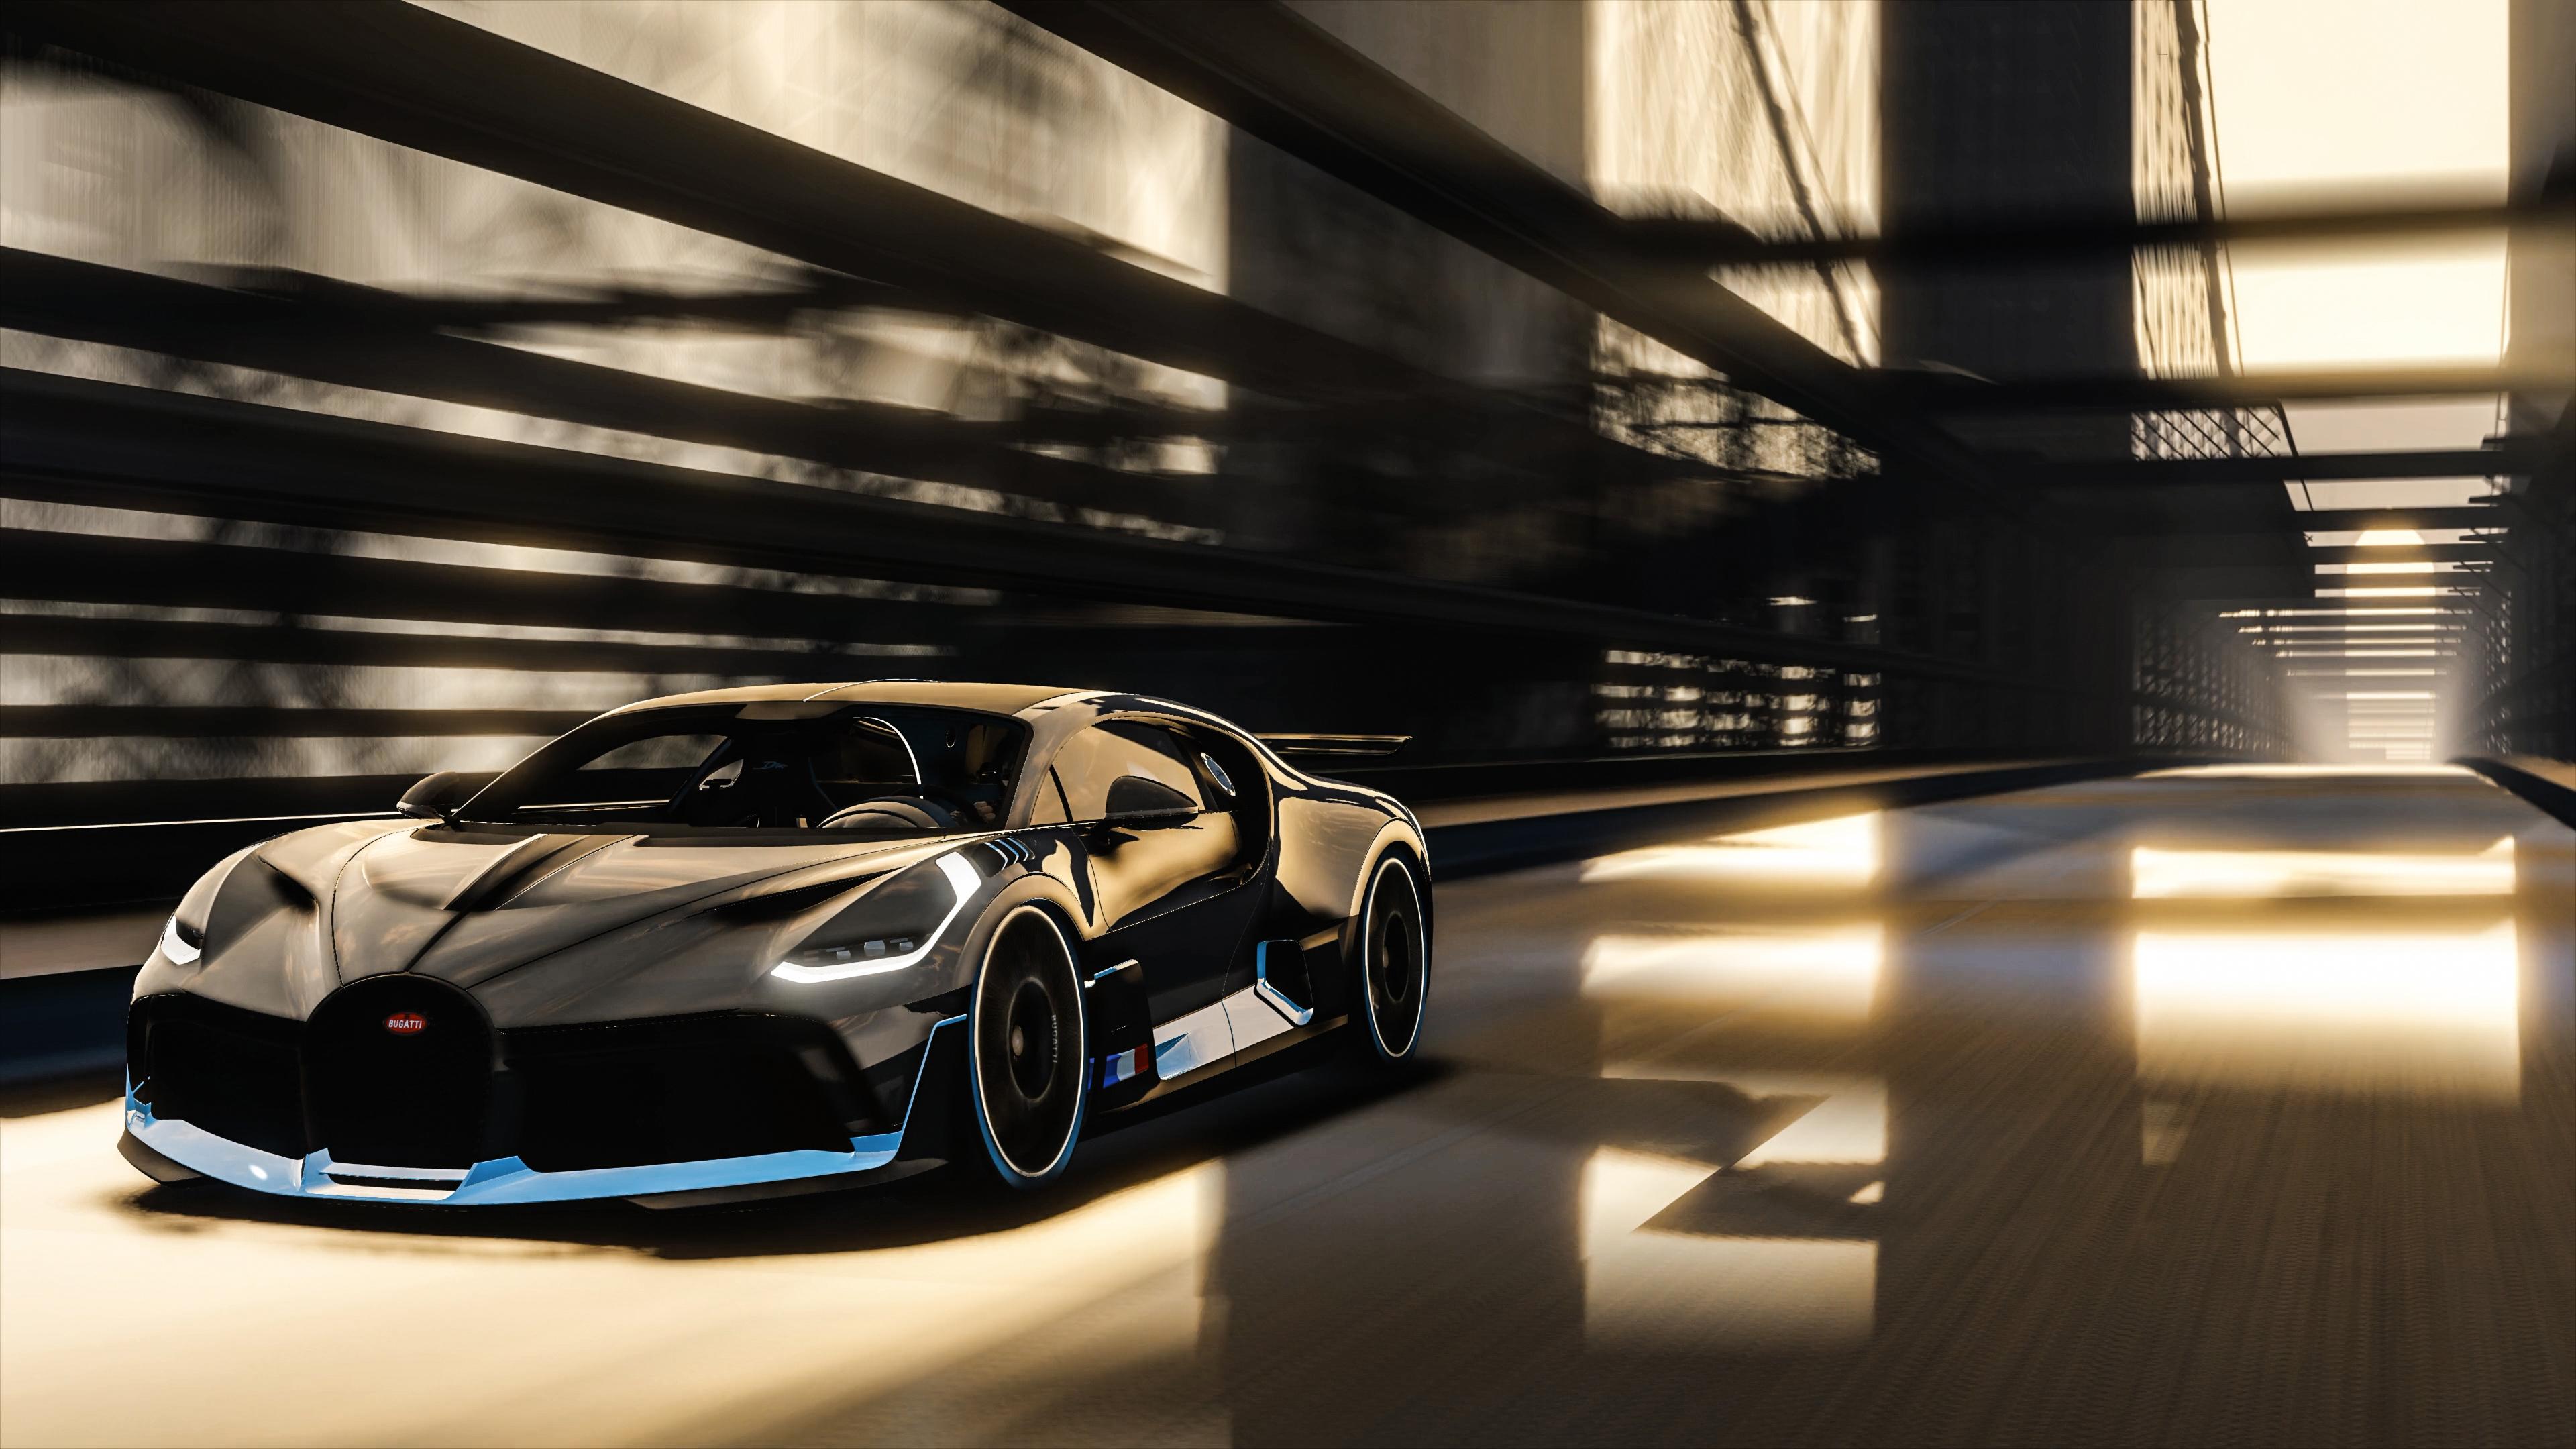 gta v bugatti divo 4k 1541295349 - Gta V Bugatti Divo 4k - hd-wallpapers, gta 5 wallpapers, cars wallpapers, bugatti wallpapers, bugatti divo wallpapers, 4k-wallpapers, 2018 cars wallpapers